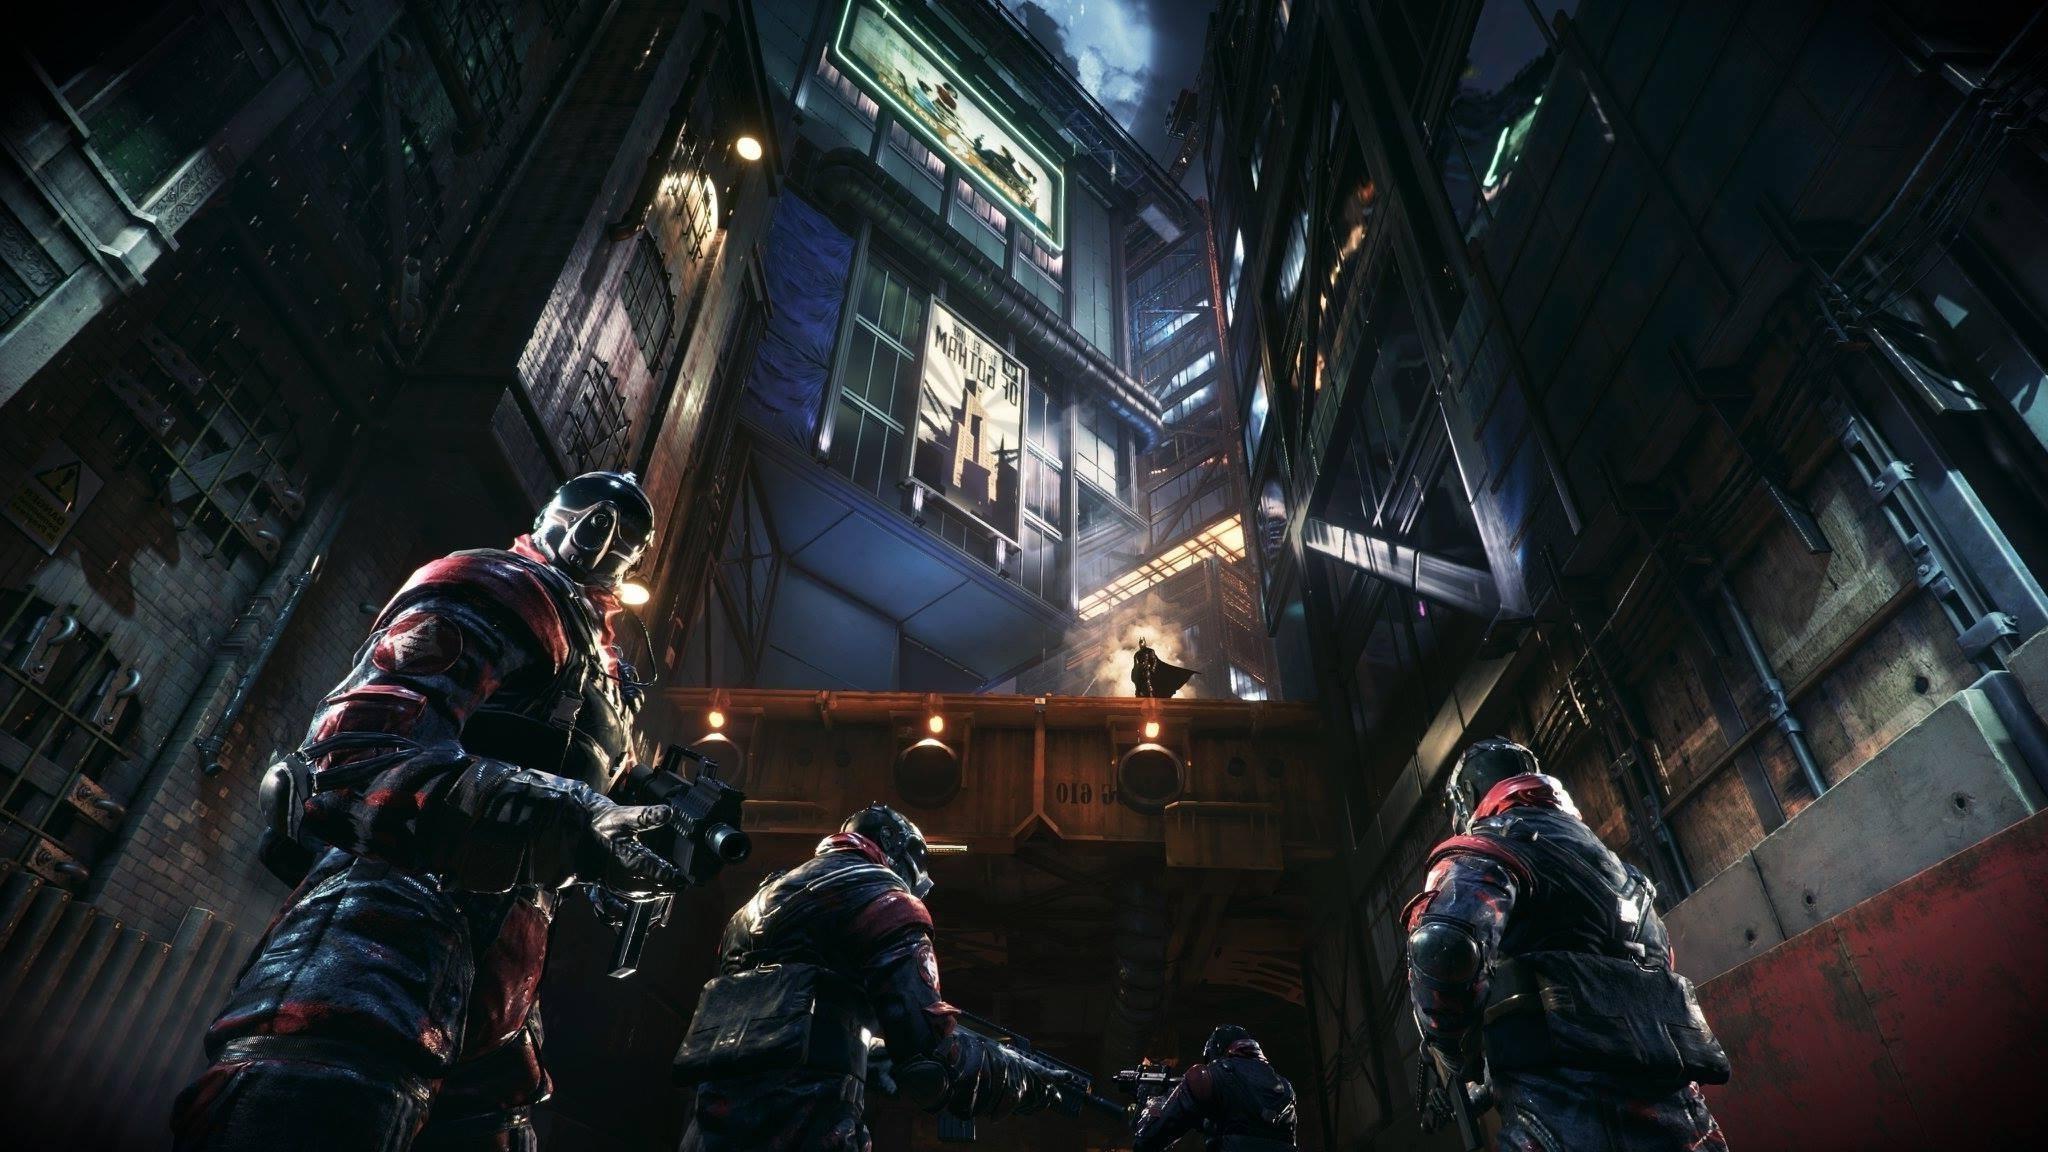 Batman, Gotham City, Batman: Arkham Knight, Fire, Street, Building  Wallpapers HD / Desktop and Mobile Backgrounds